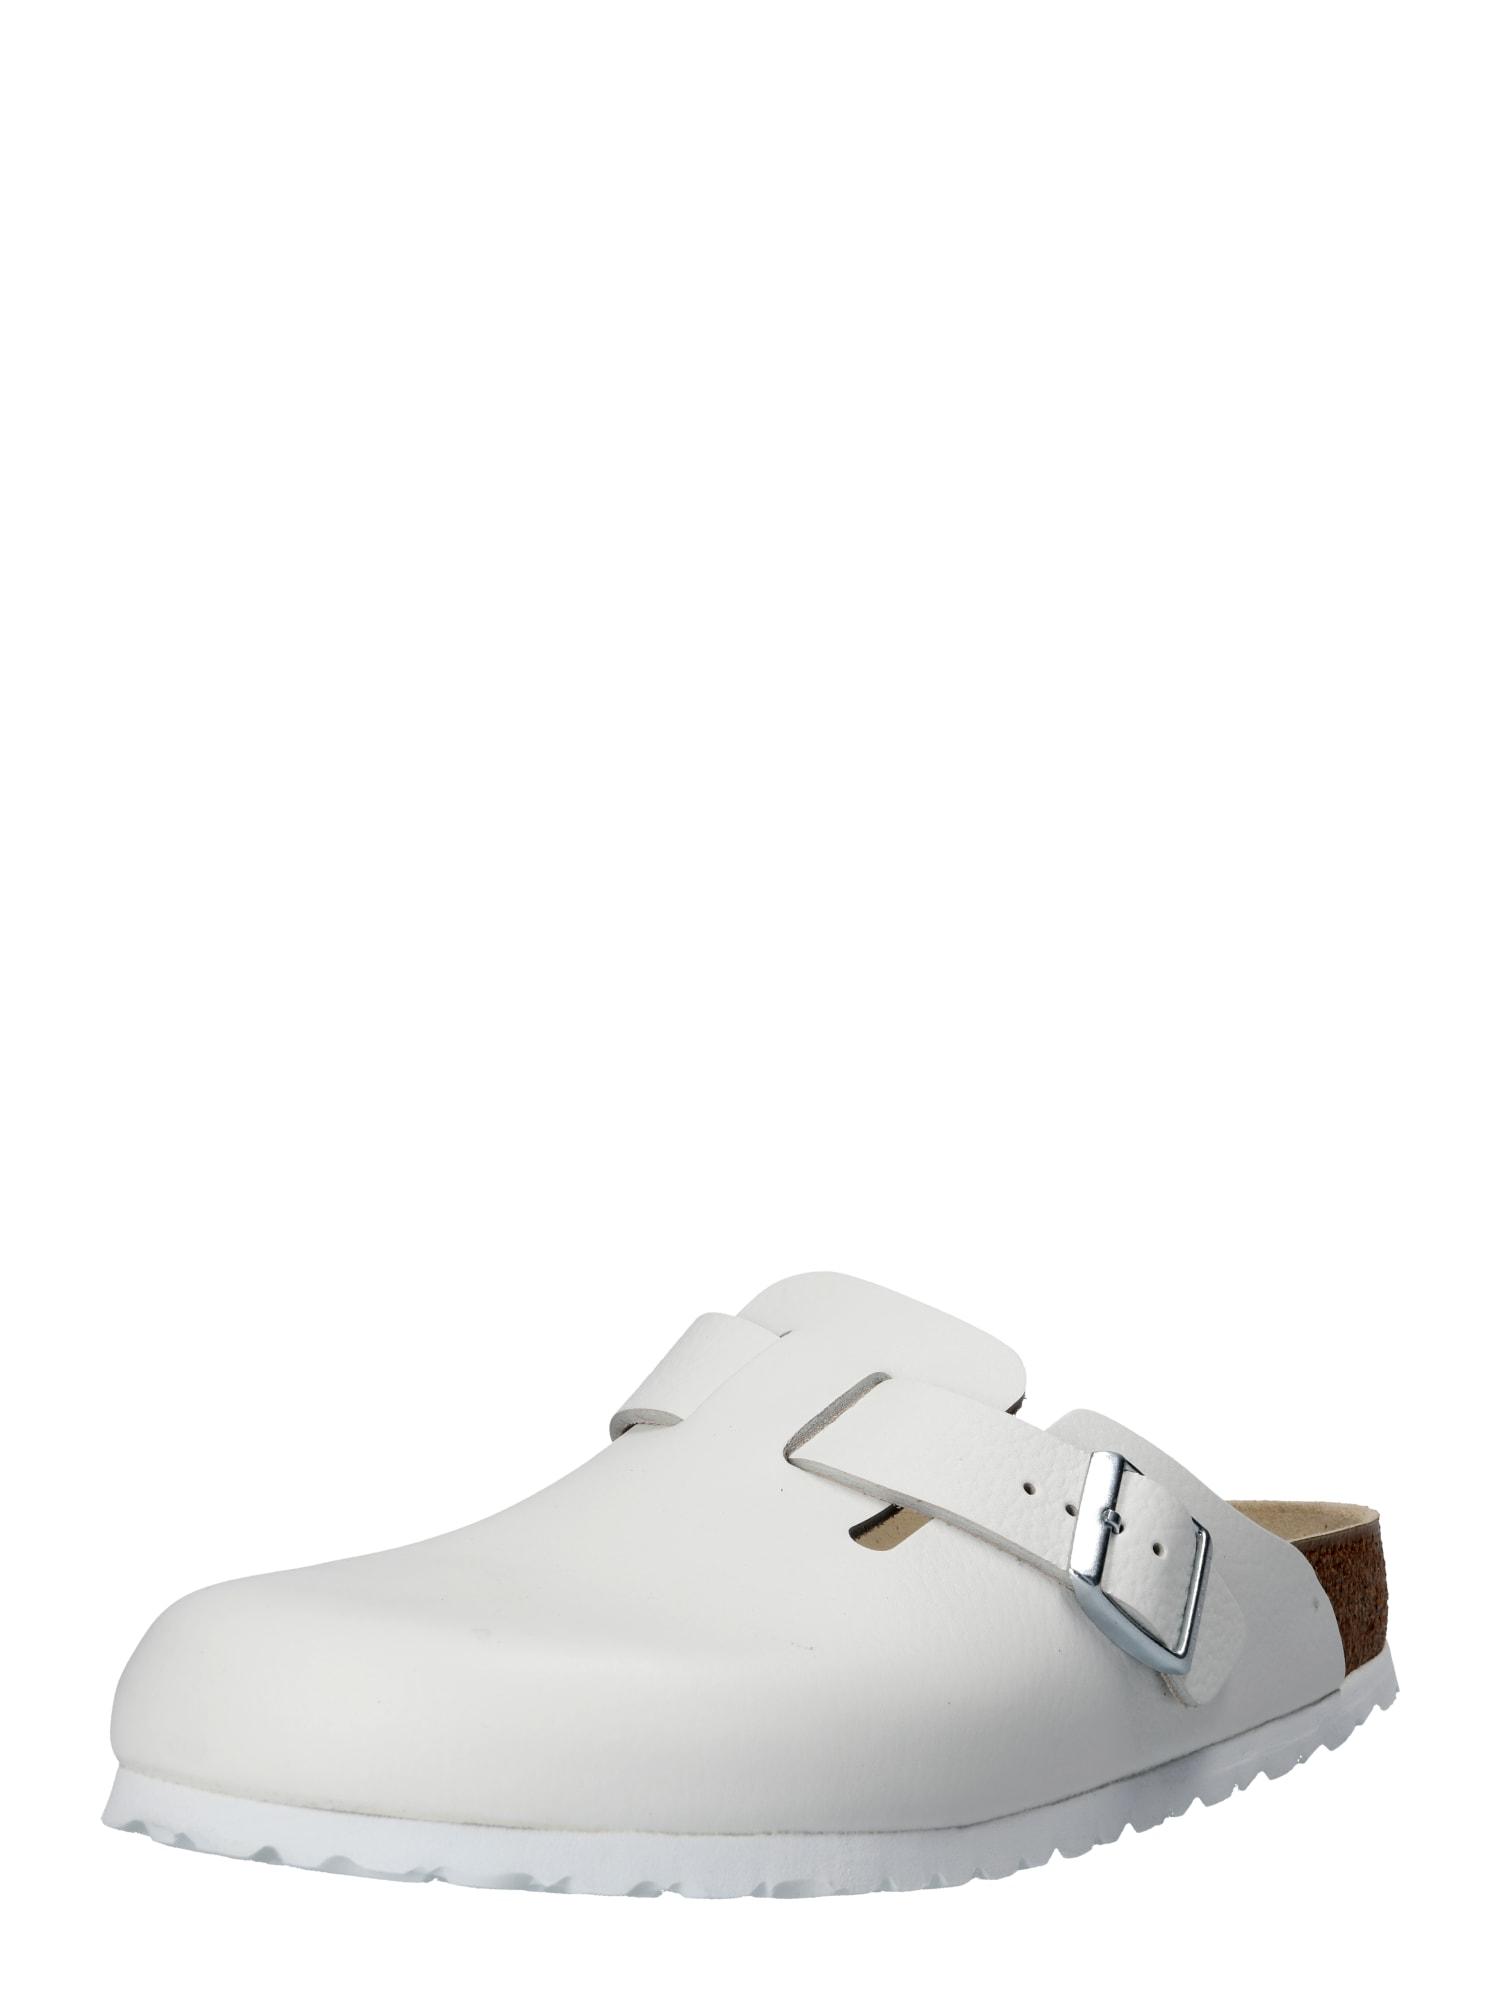 Pantofle BOSTON bílá BIRKENSTOCK